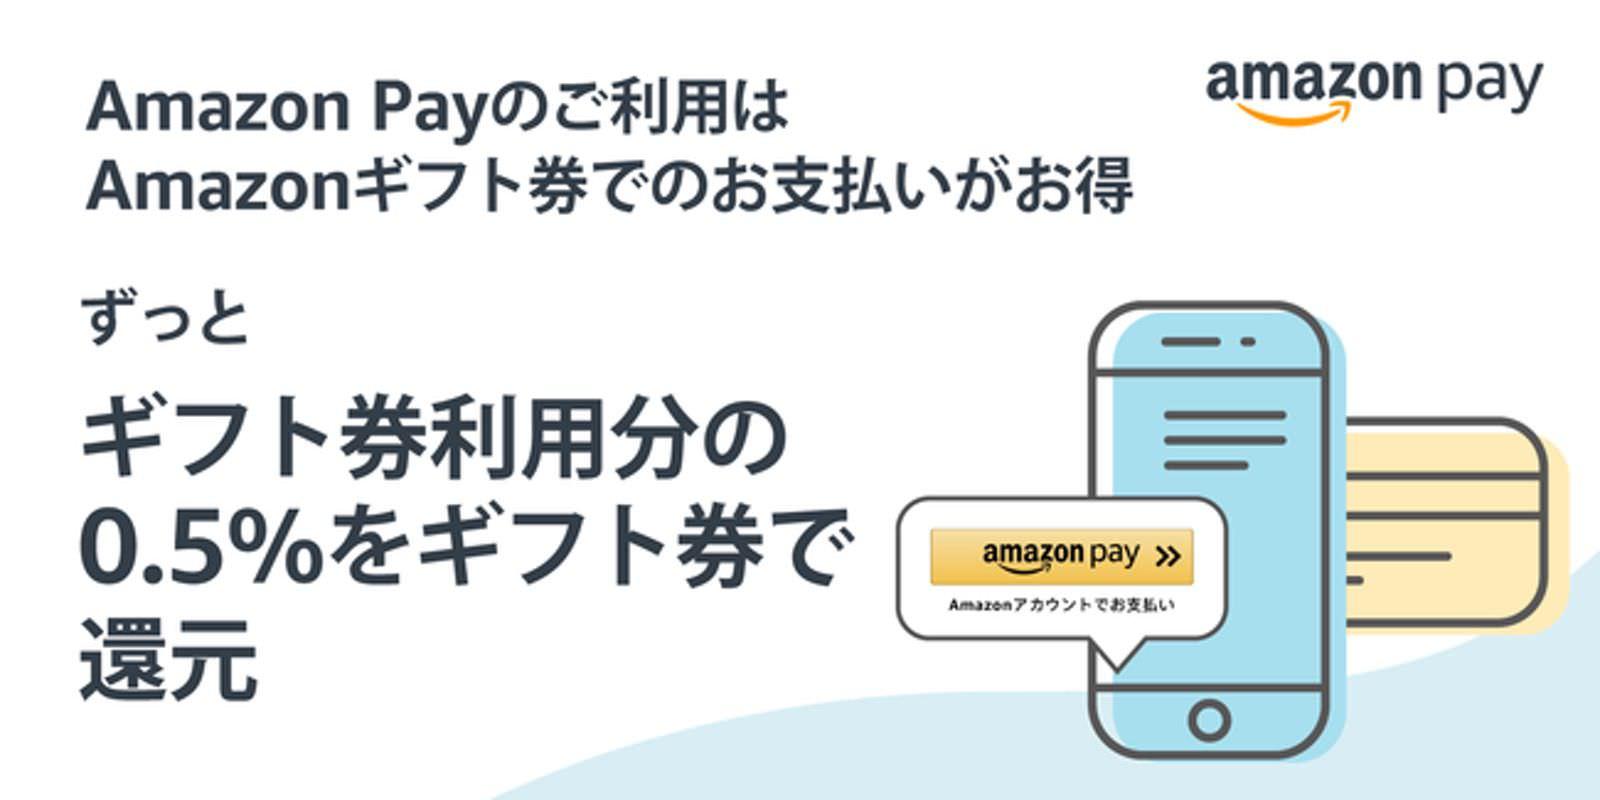 Amazon Gift Pay